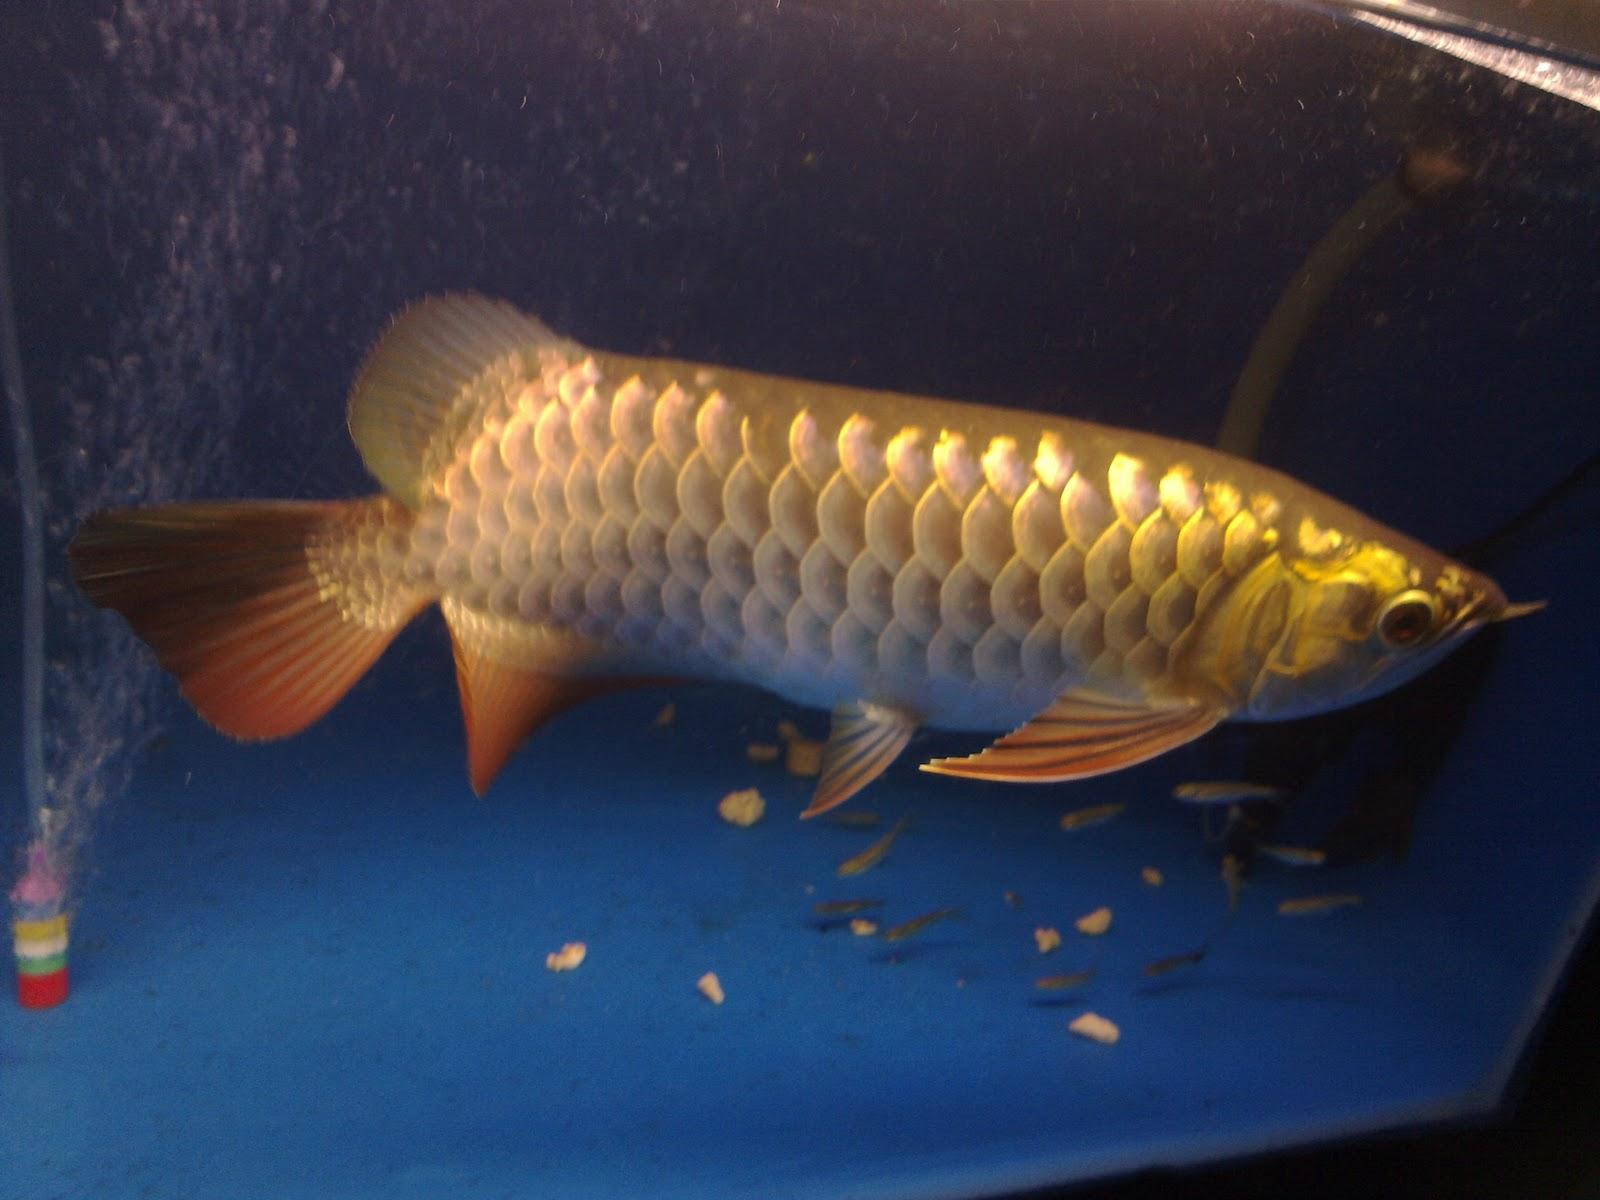 Sk aquaculture sdn bhd rnr aquaculture sdn bhd arowana for Arowana fish for sale online